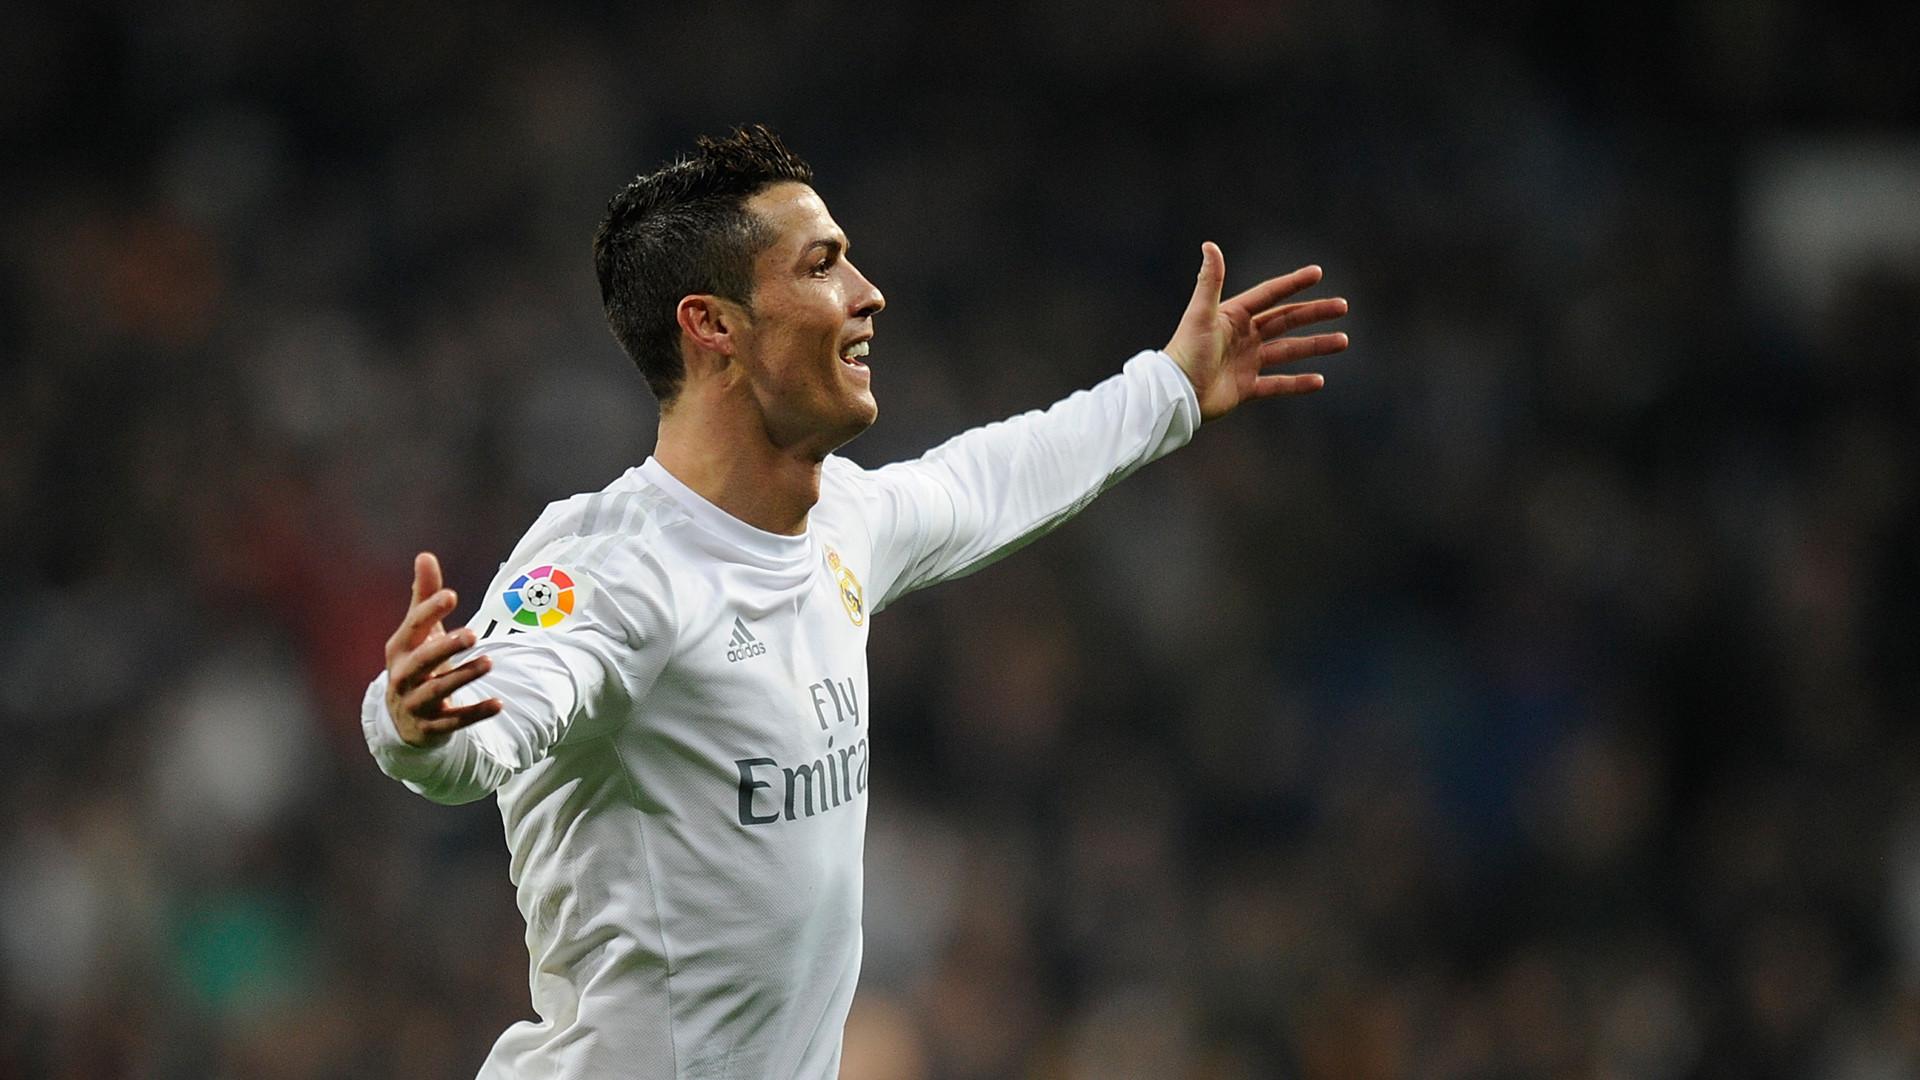 To celebrate Ronaldo's 31st birthday, Guillem Balague talks us through his  favourite La Liga goals